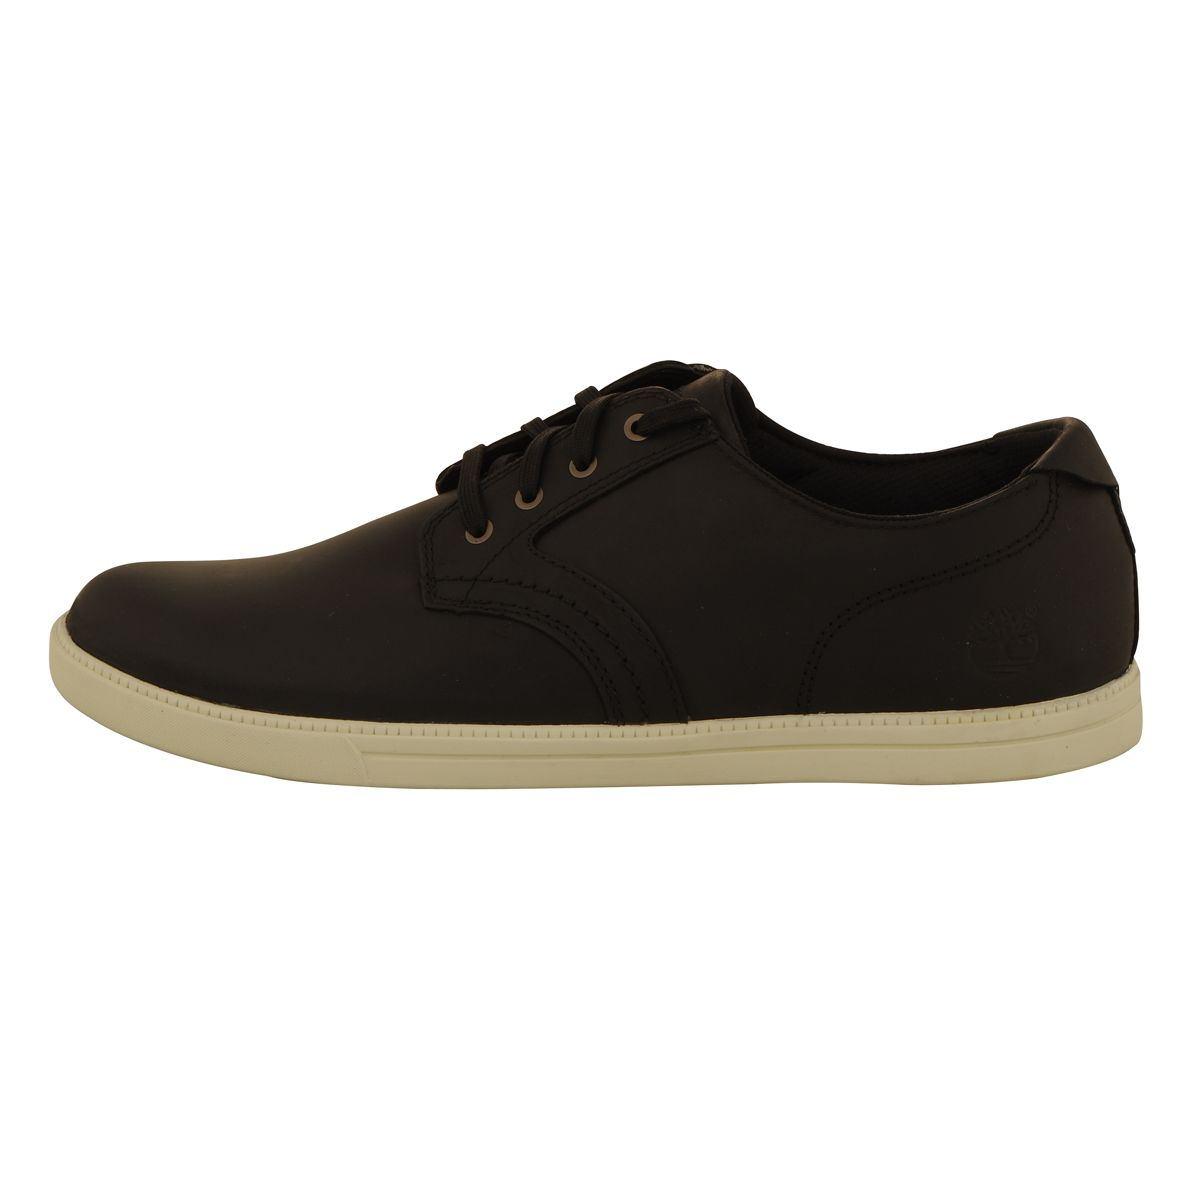 chaussures fulk lp ox noires grande taille du 46 au 50. Black Bedroom Furniture Sets. Home Design Ideas